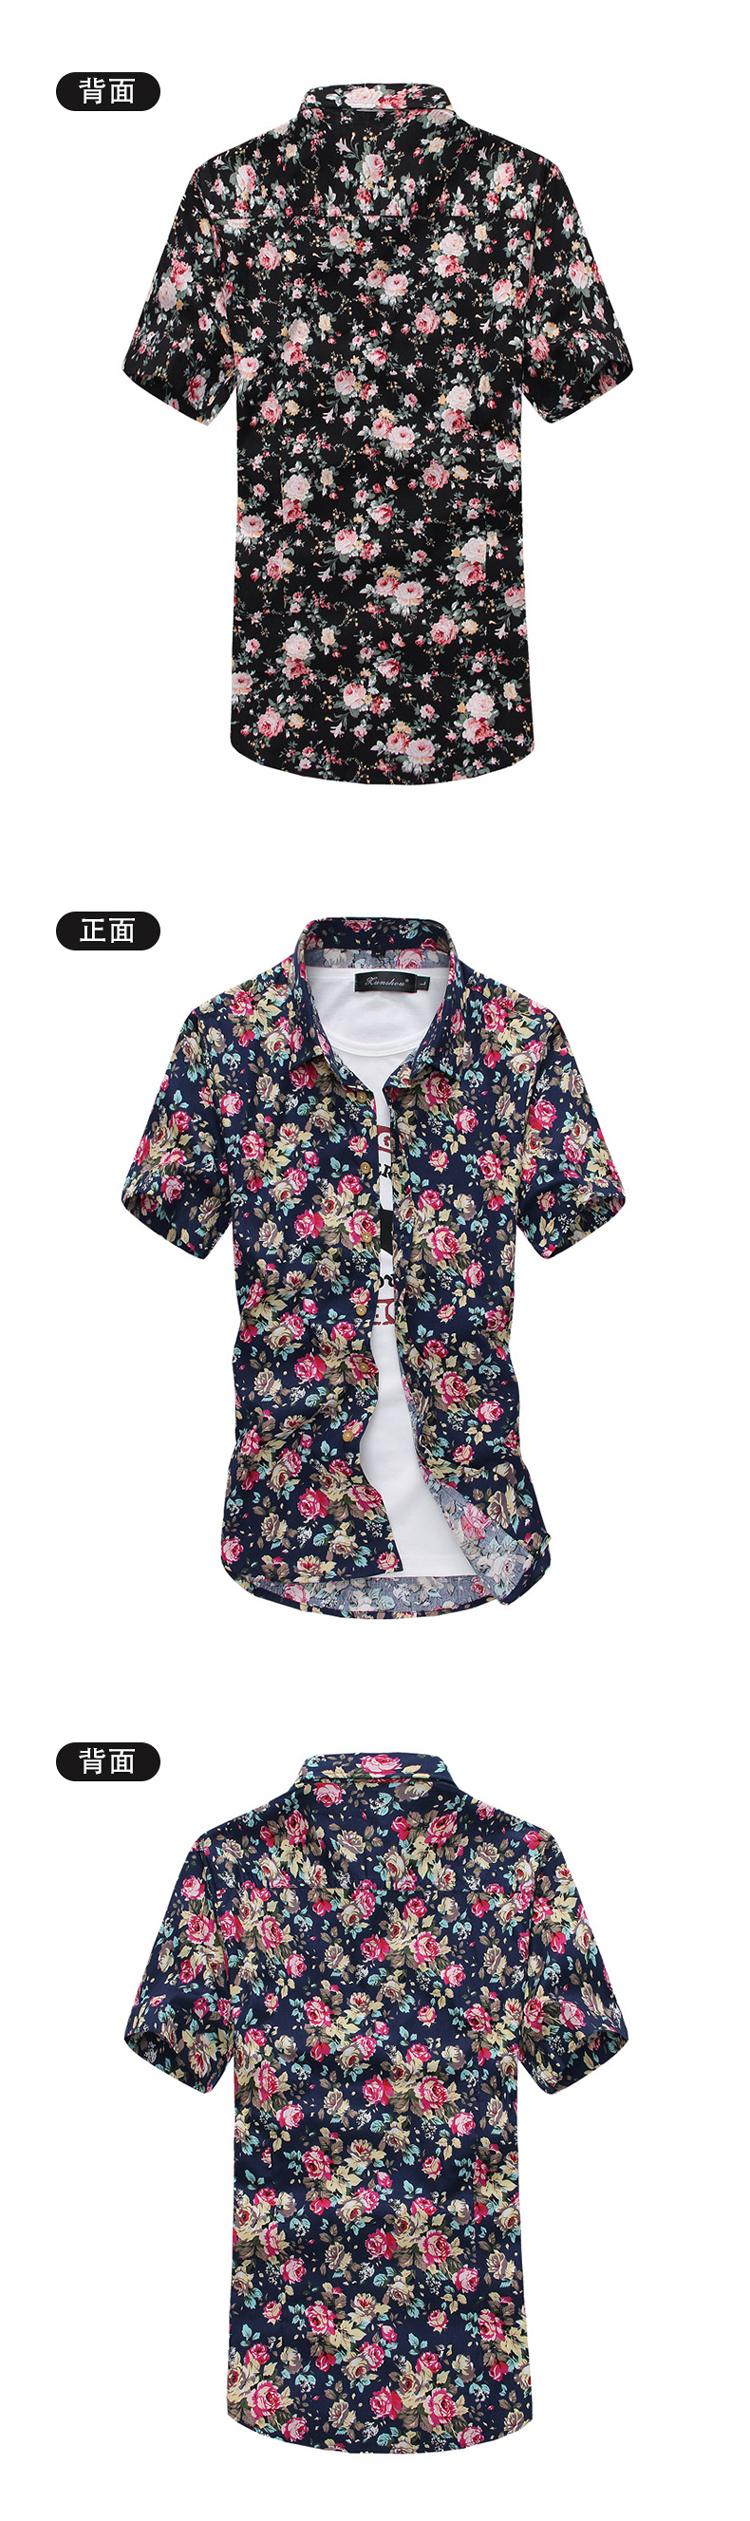 Men Summer Thin Shirts Short Sleeve Floral Shirts New Fashion Men Outwear Casual Slim Shirts Mens Cotton dress shirts 11 Online shopping Bangladesh